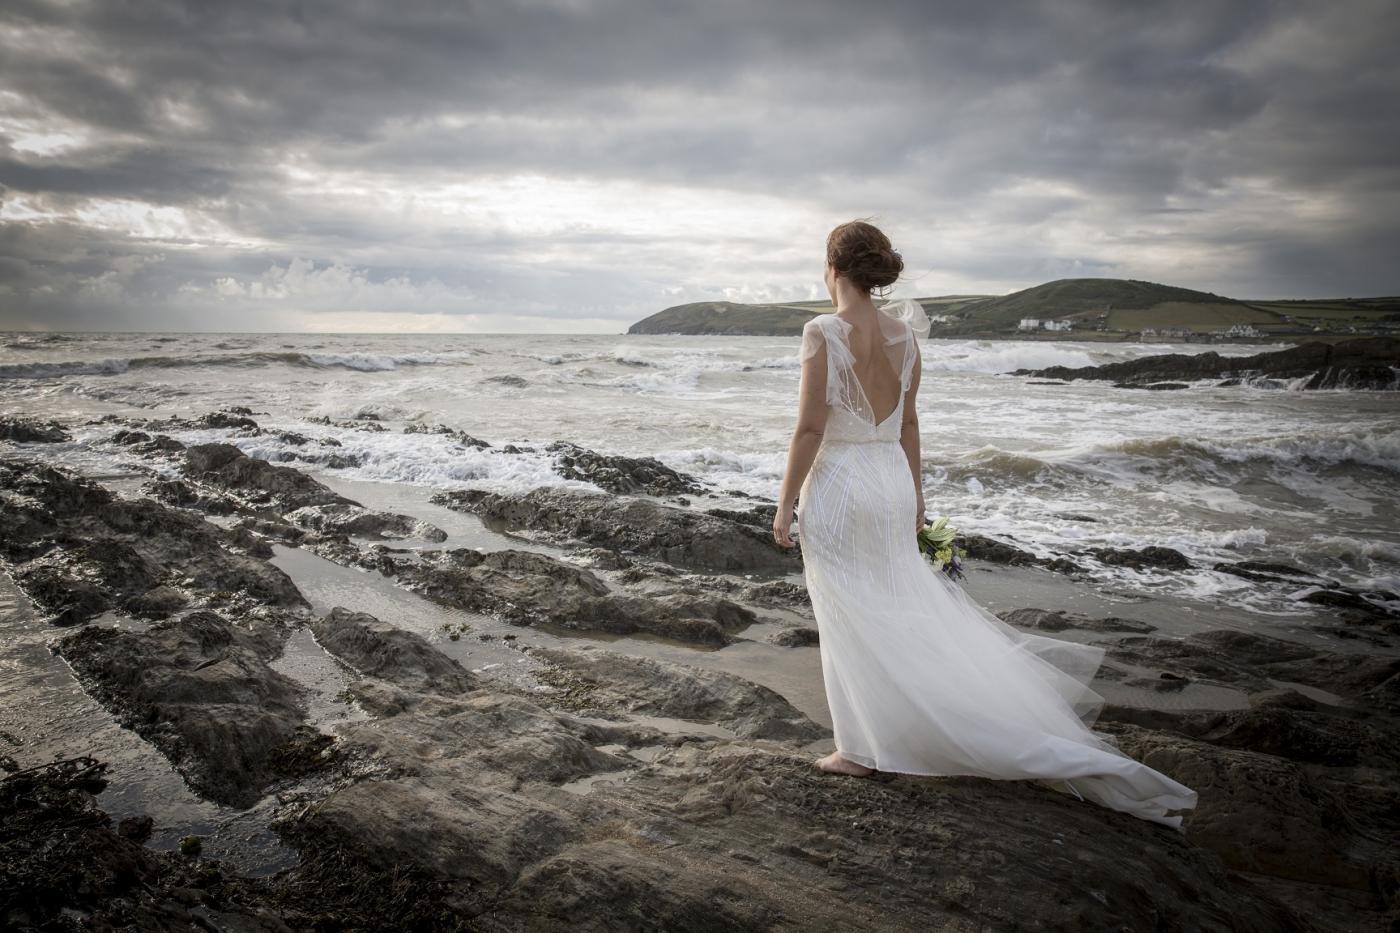 Outdoor Wedding Venue Croyde Beach Official Guide